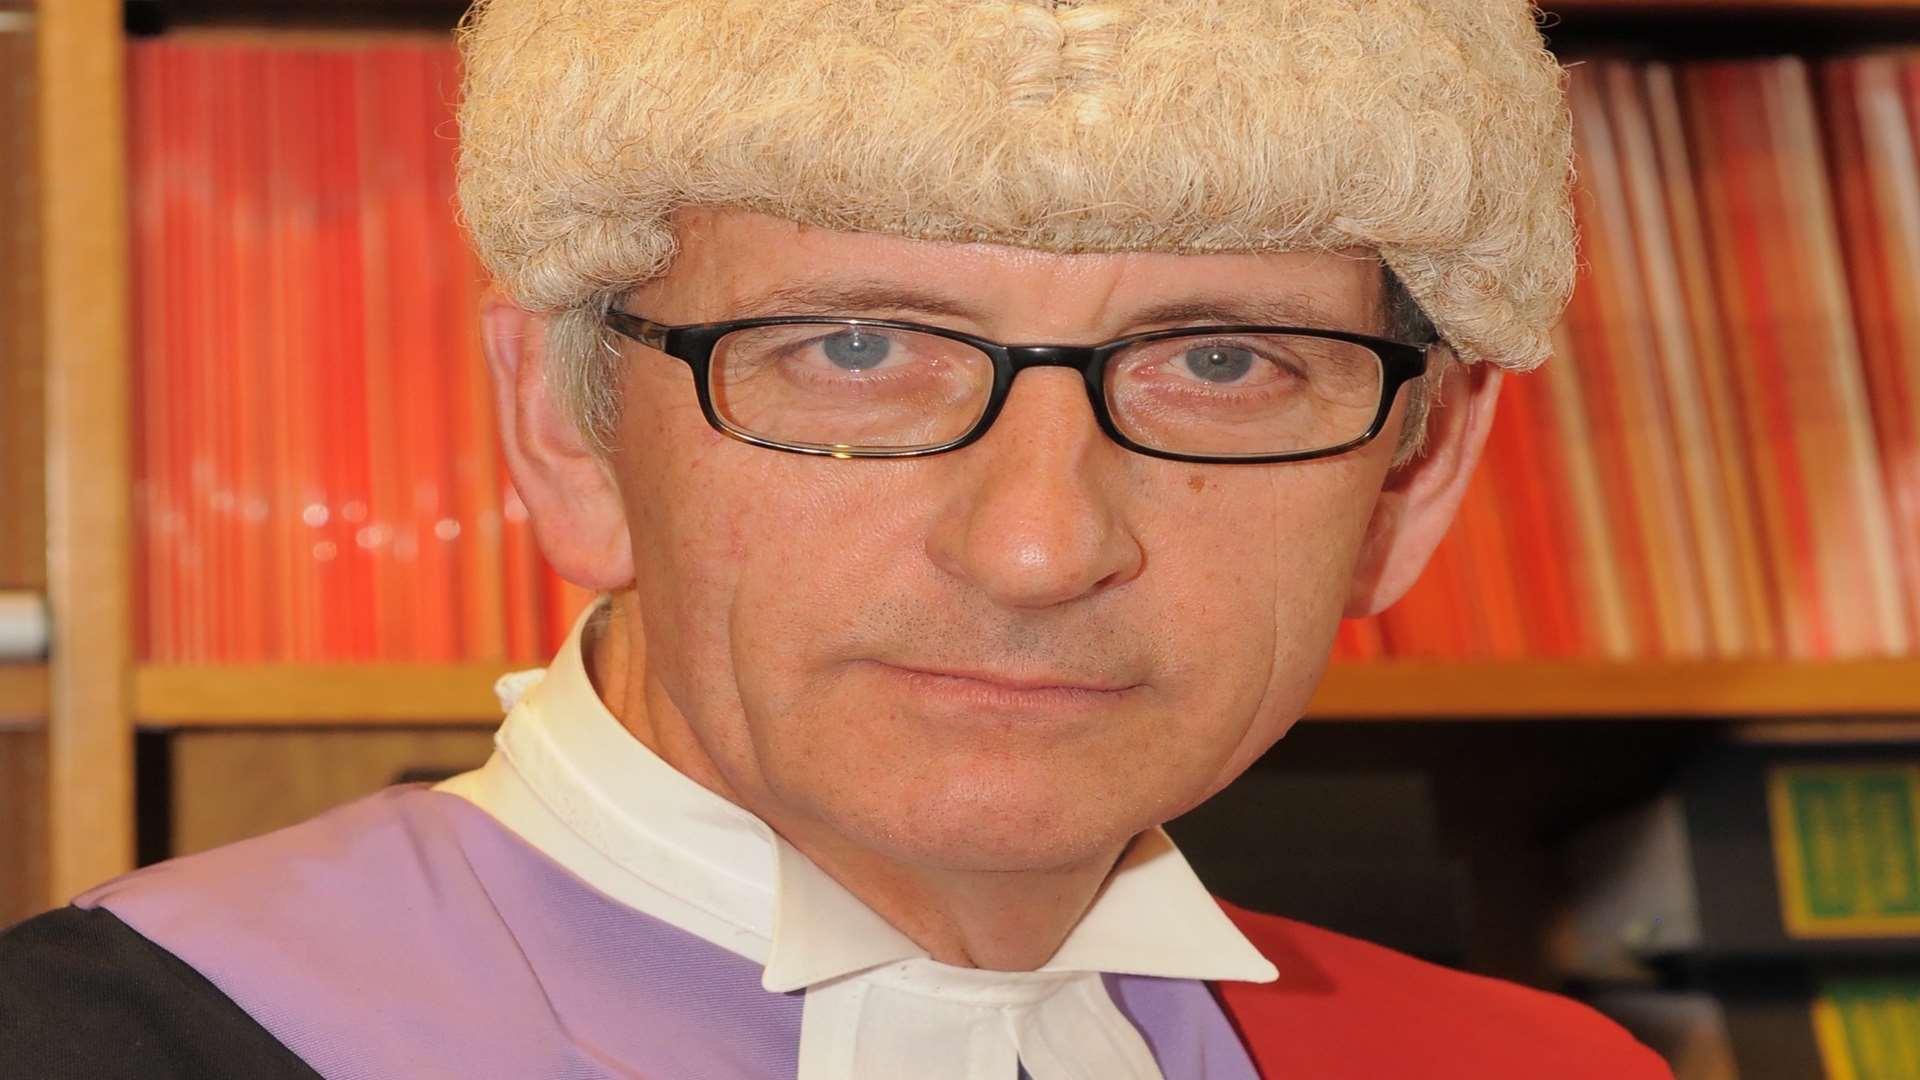 Teen rapist Isaiah Morgan, from Gillingham jailed for raping